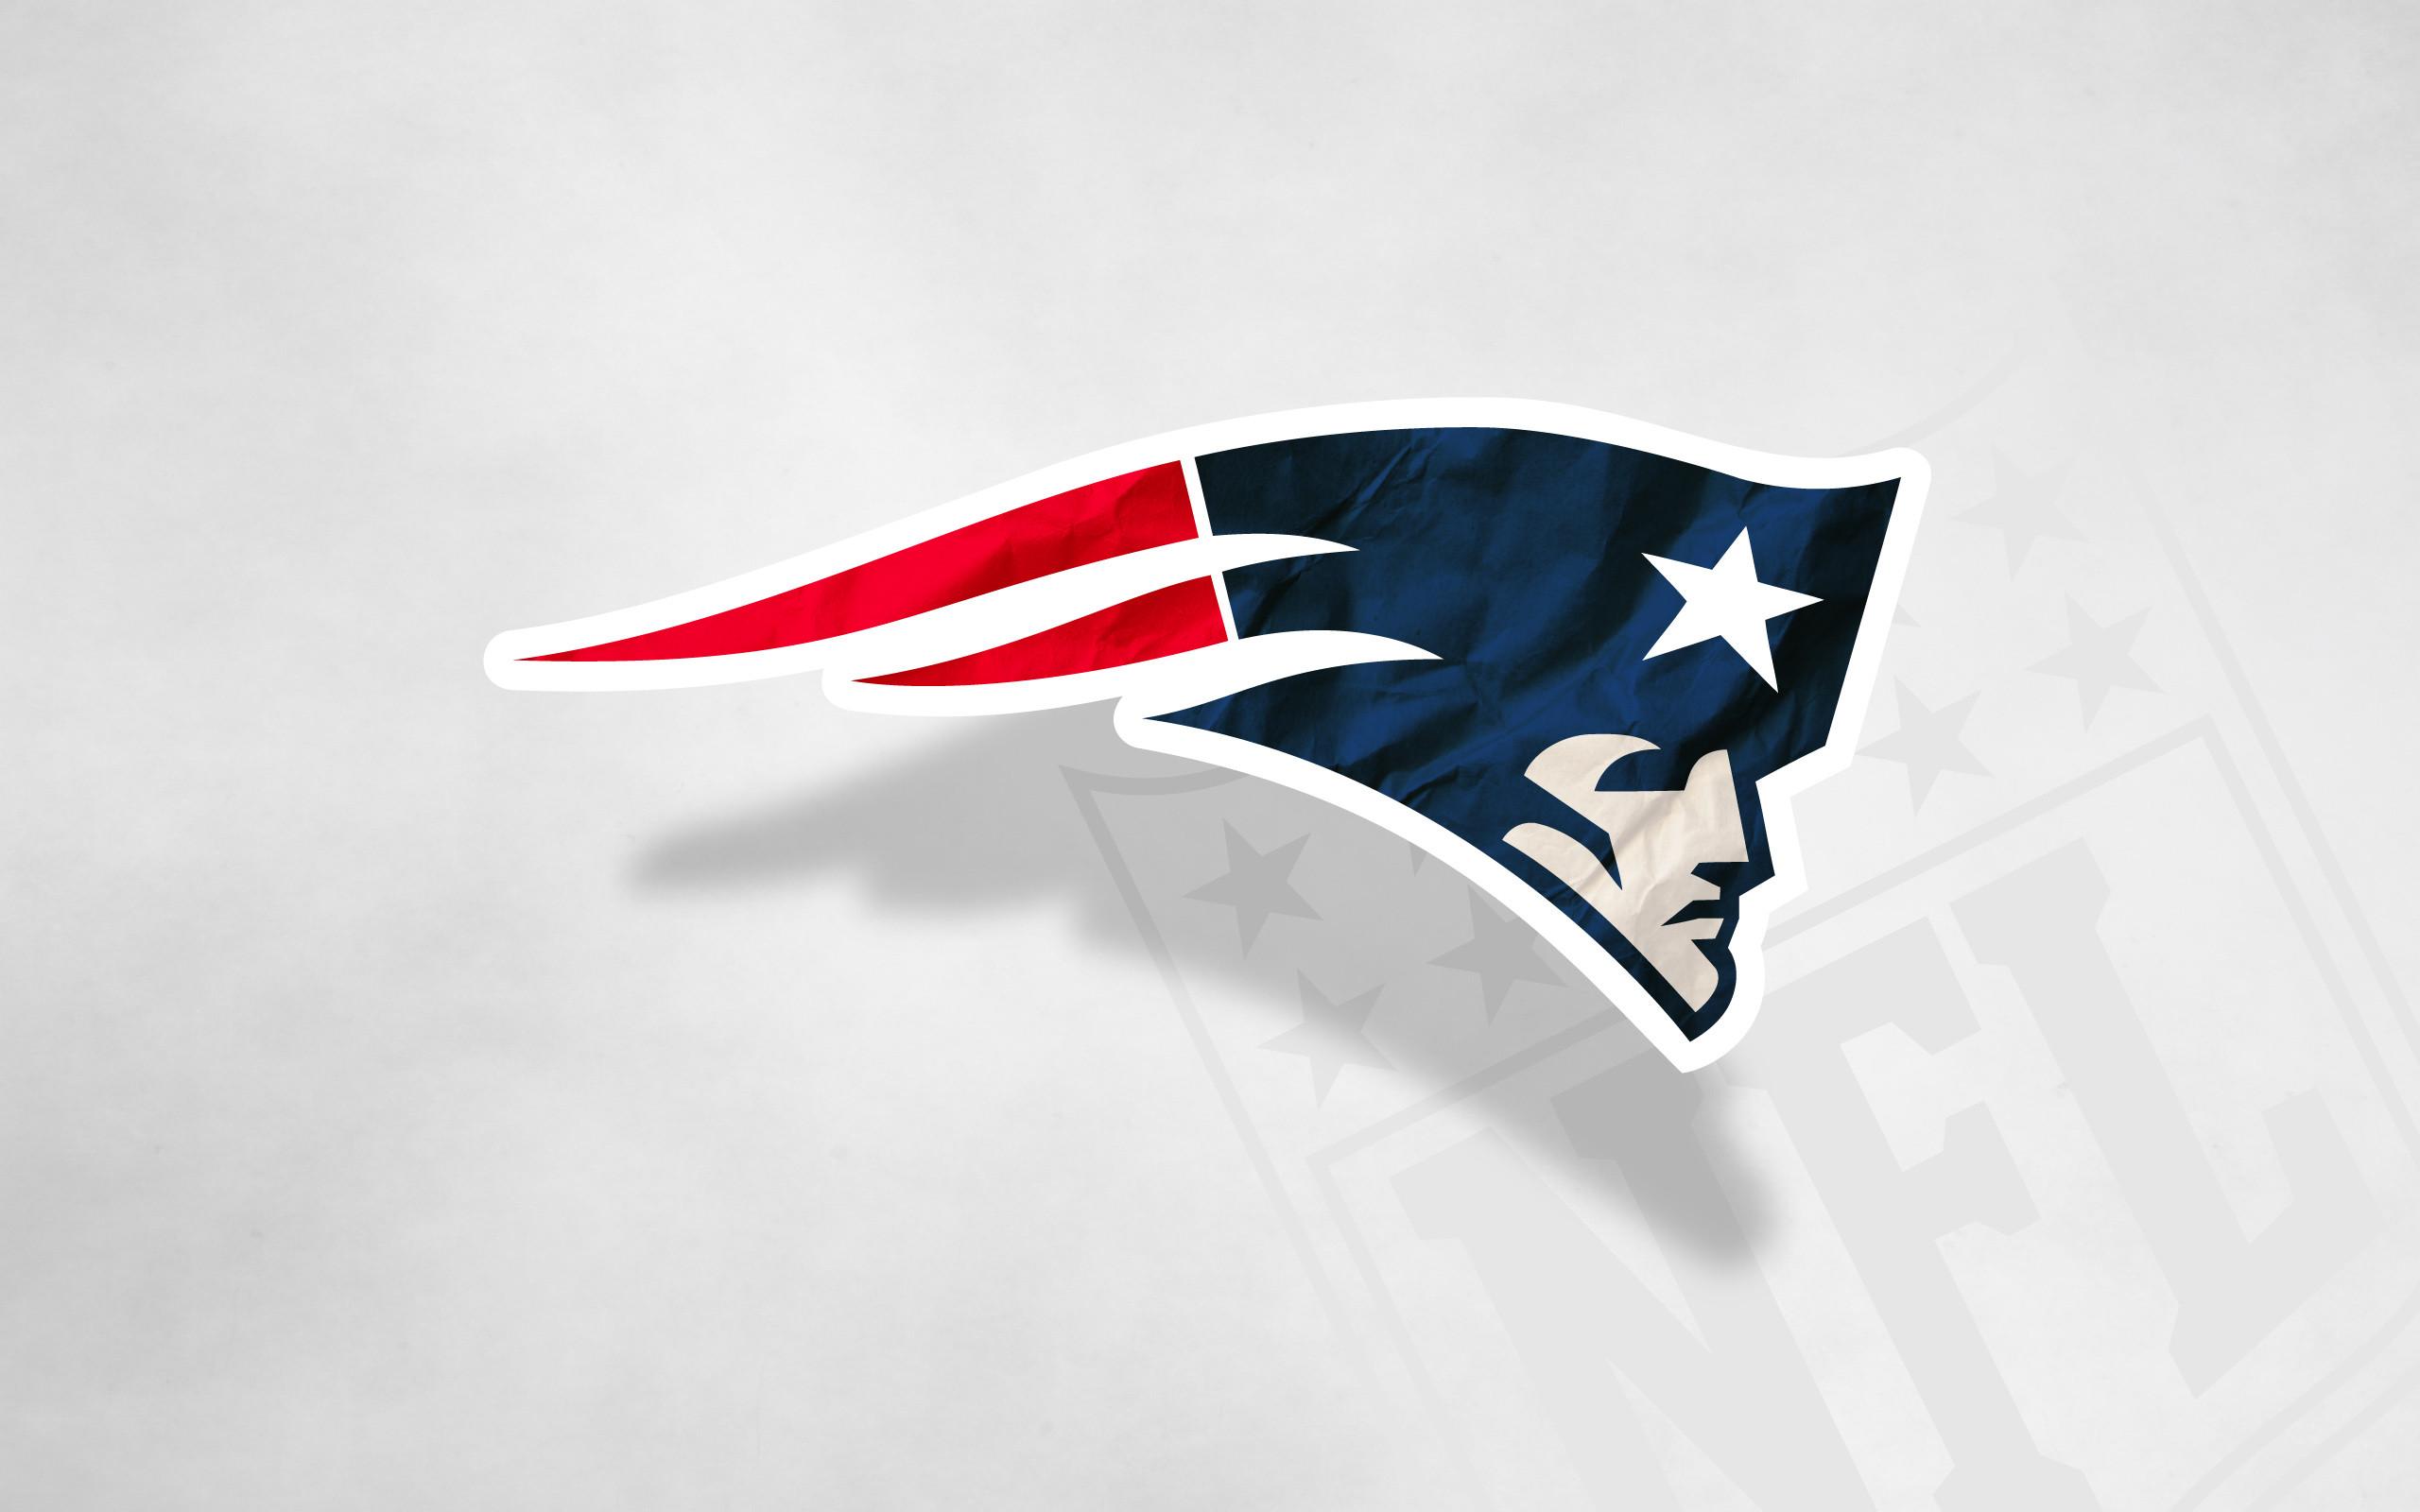 Hd Wallpapers New England Patriots Logo 1024 X 768 136 Kb Jpeg